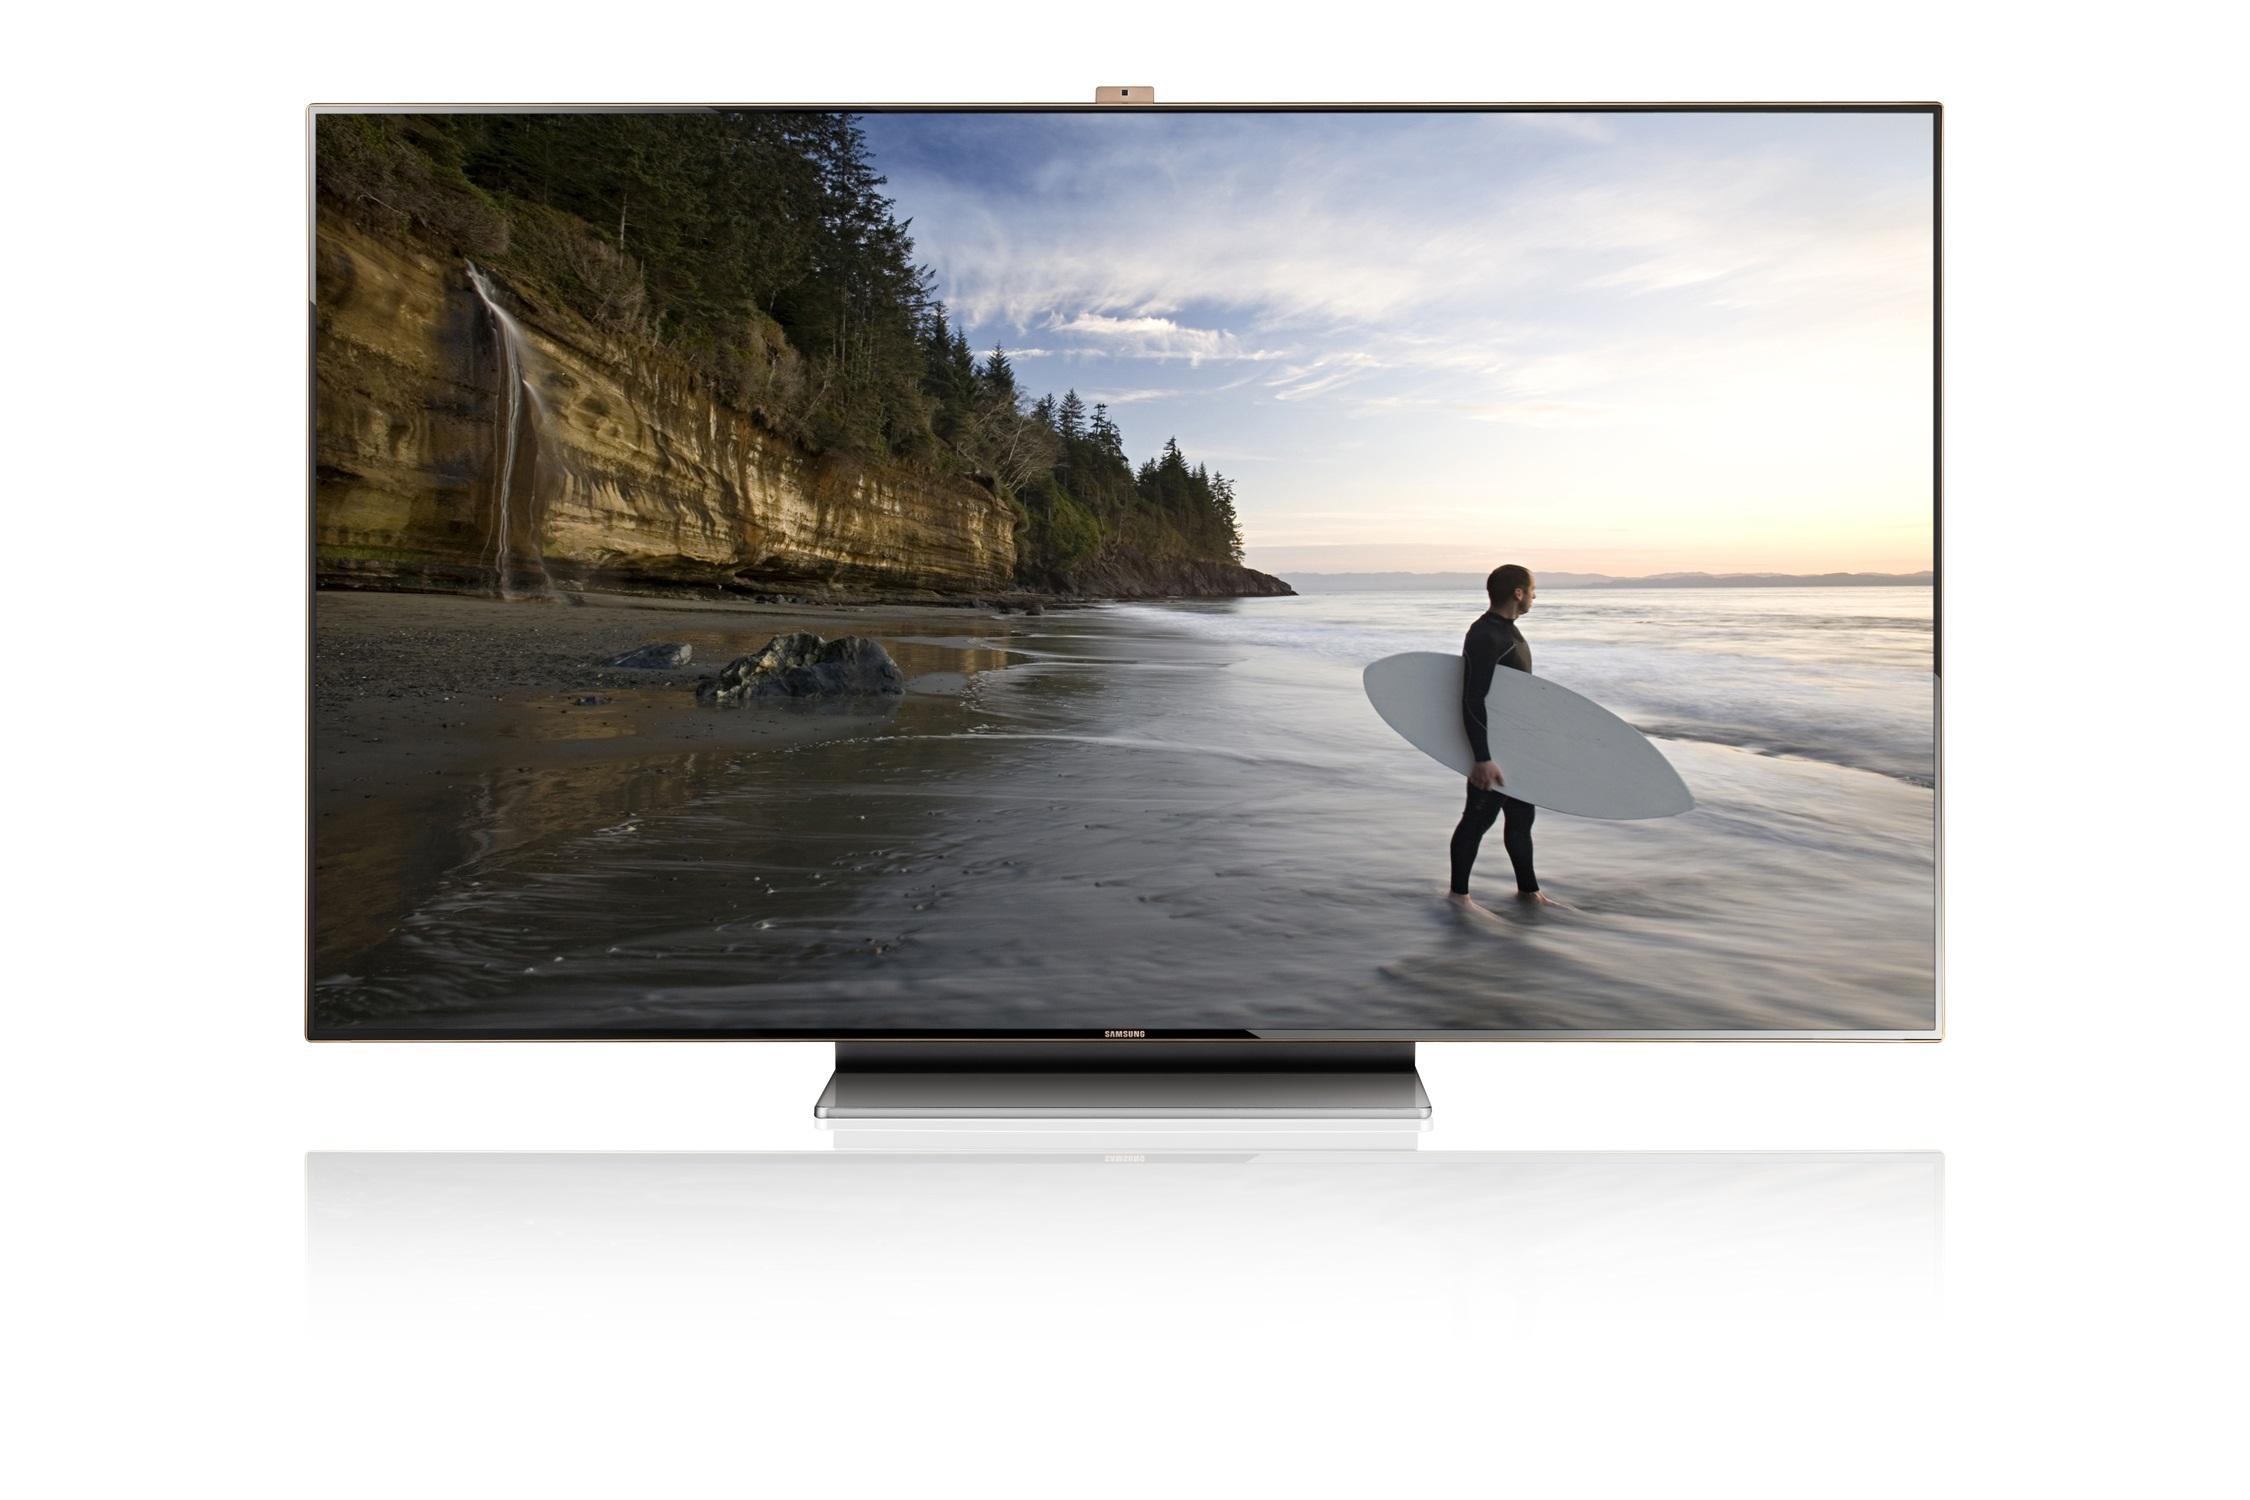 Samsung SMART TV ES9000_Front